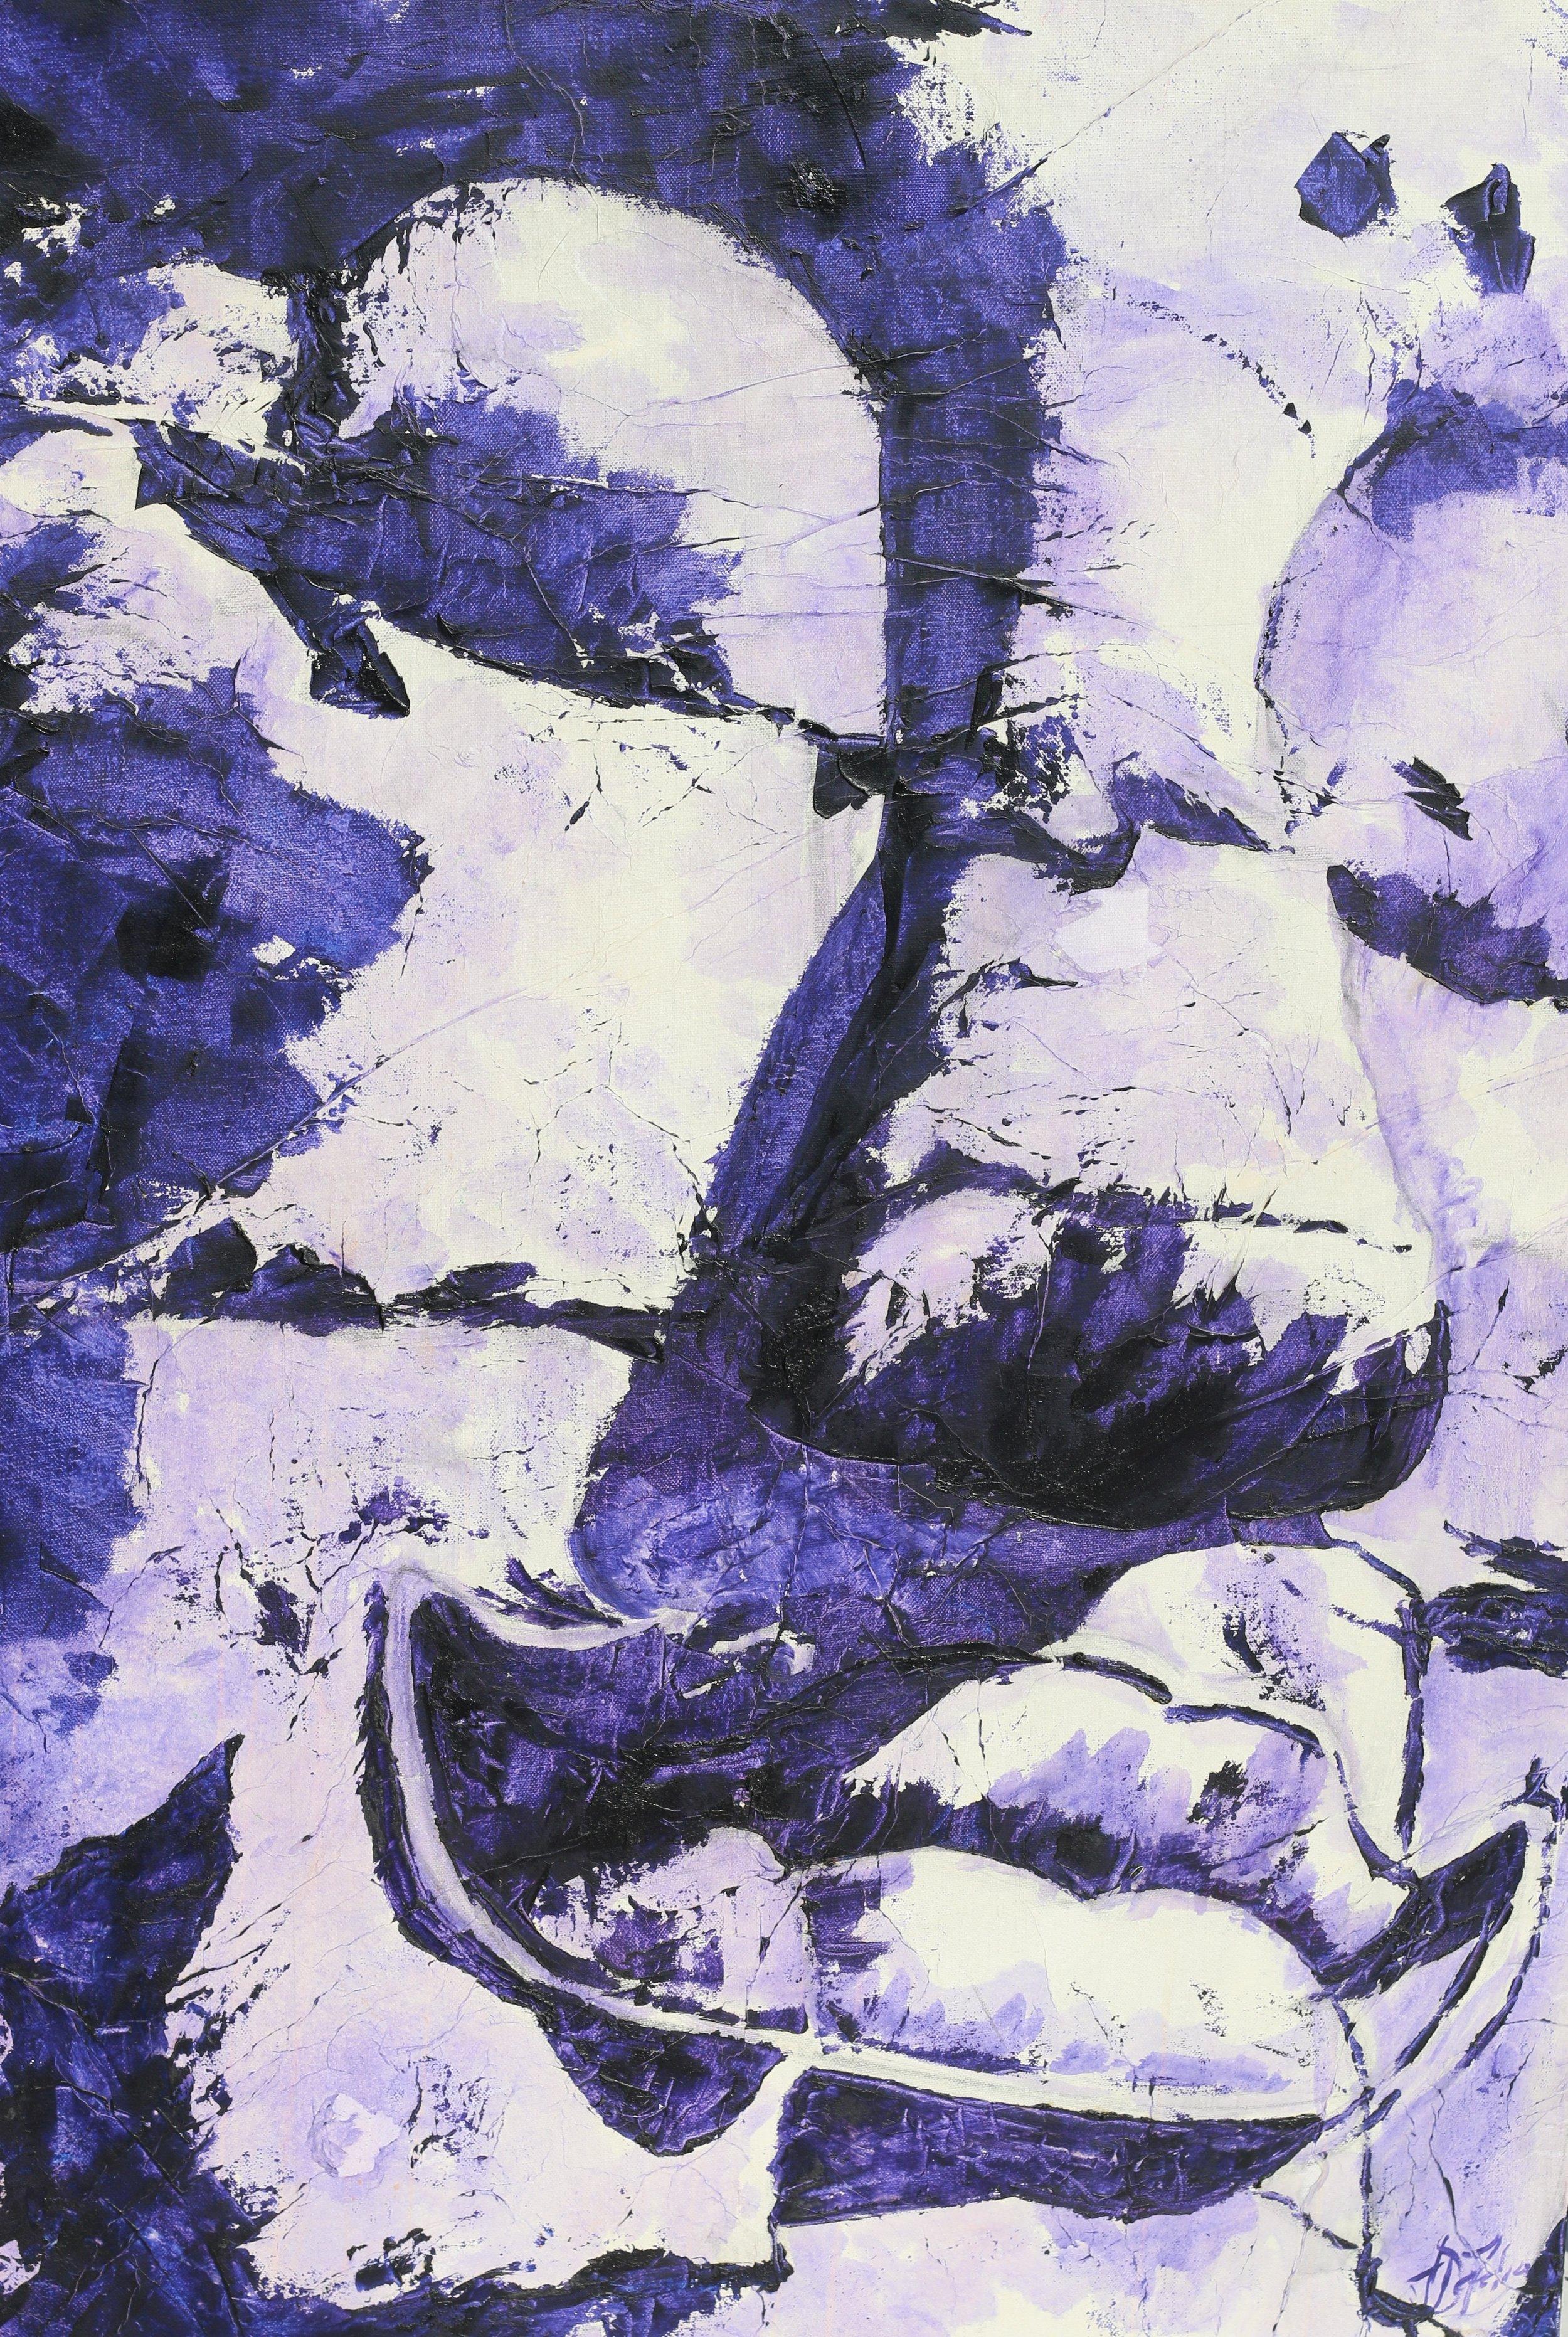 Jill DeFelice: Violet Buddha